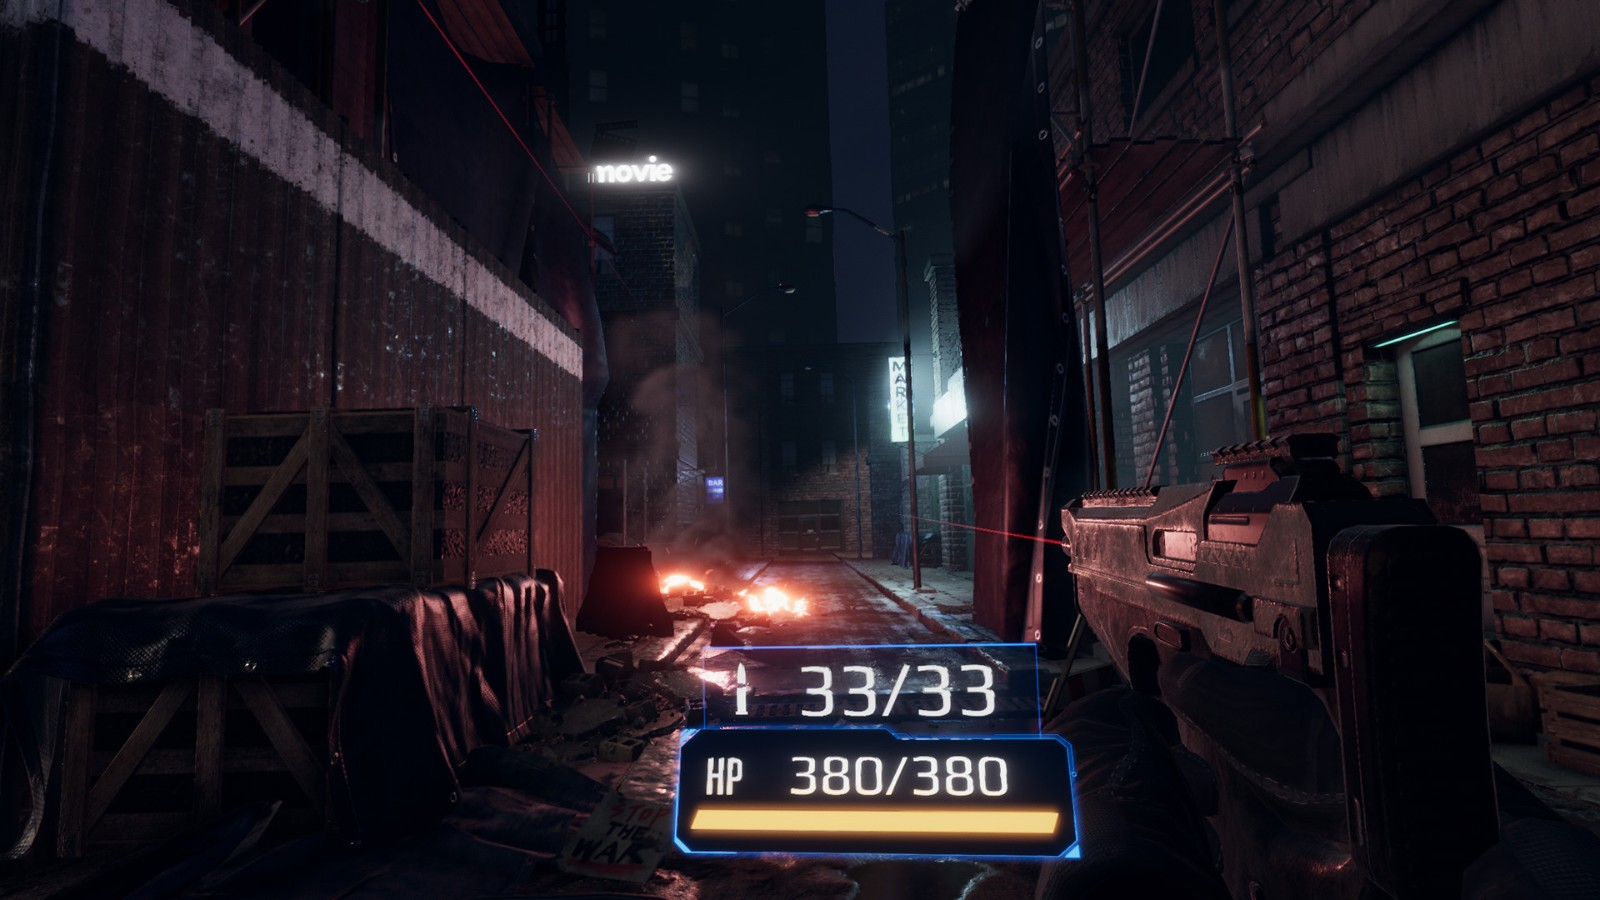 VR僵尸射击游戏《VAR: Exterminate》上架Steam 推选GTX 1080